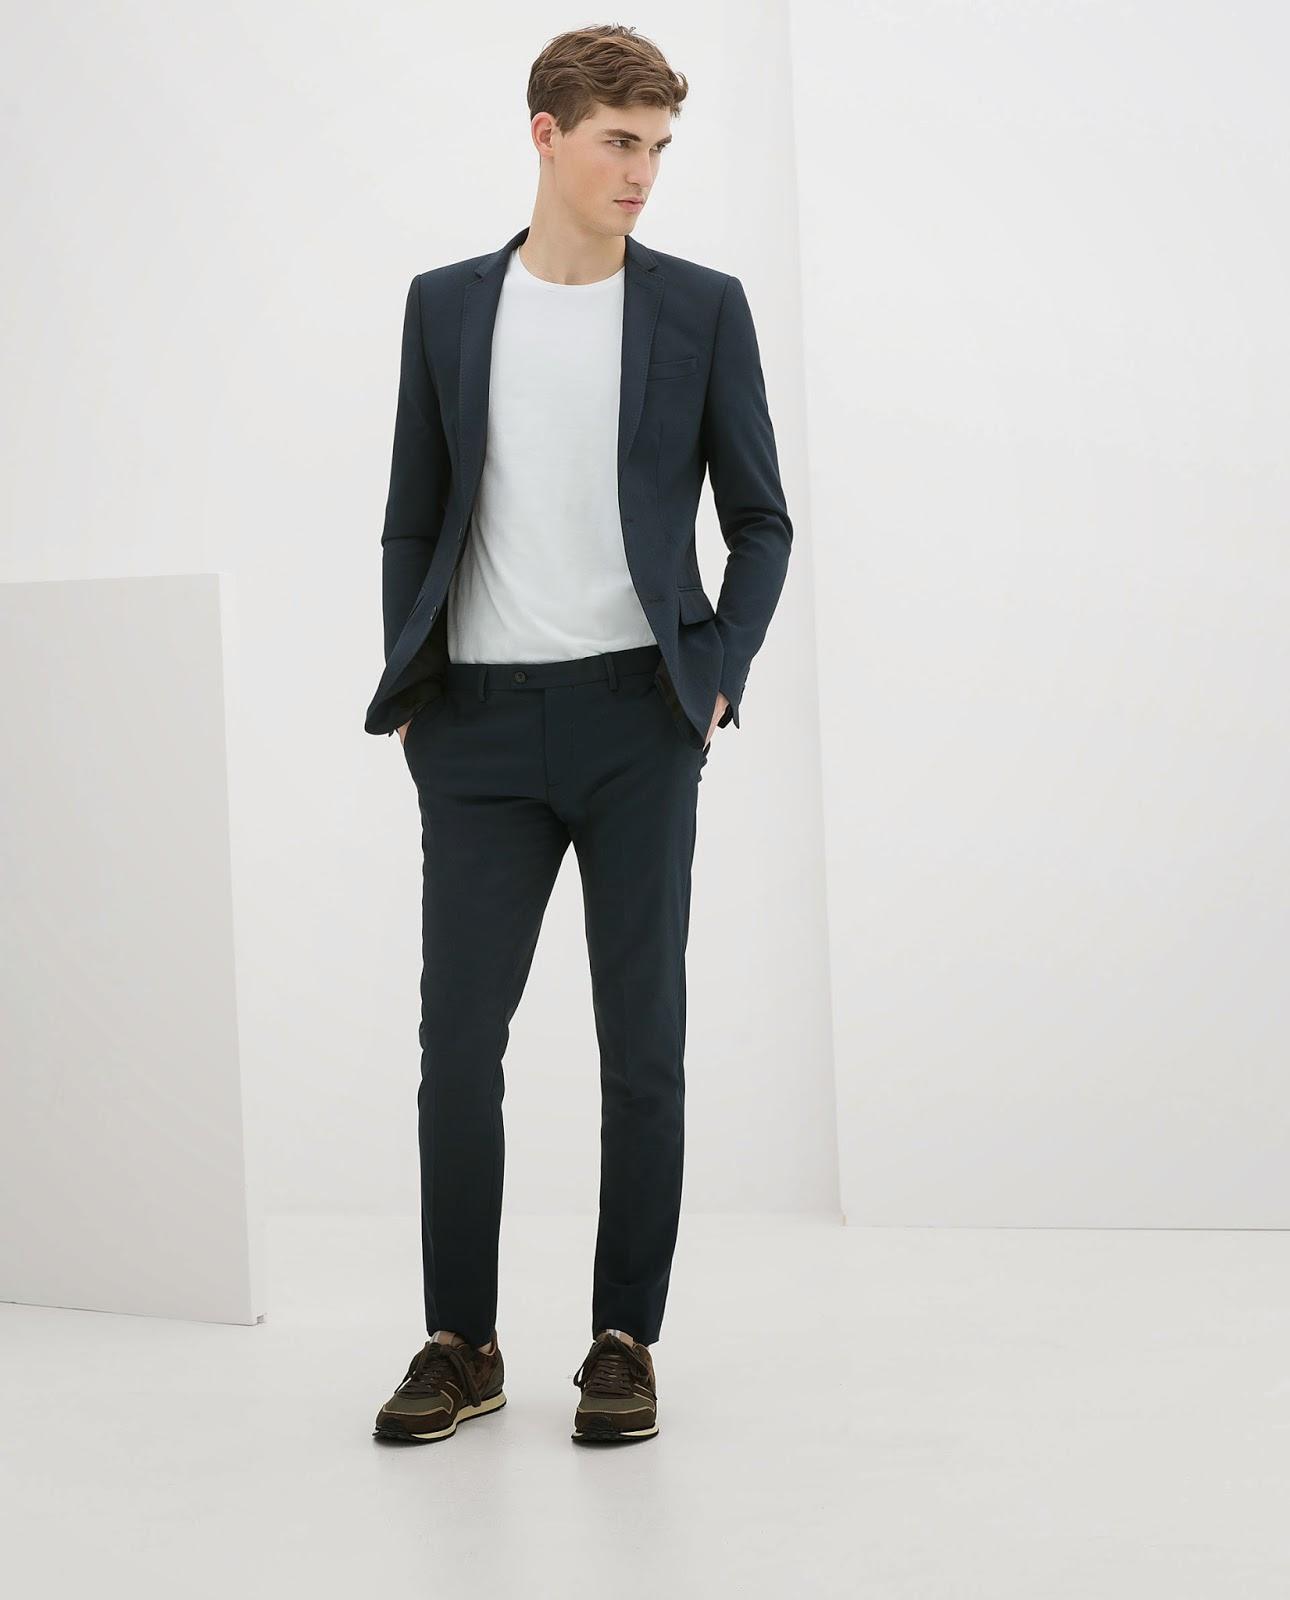 Style Instinct The Perfect Wardrobe